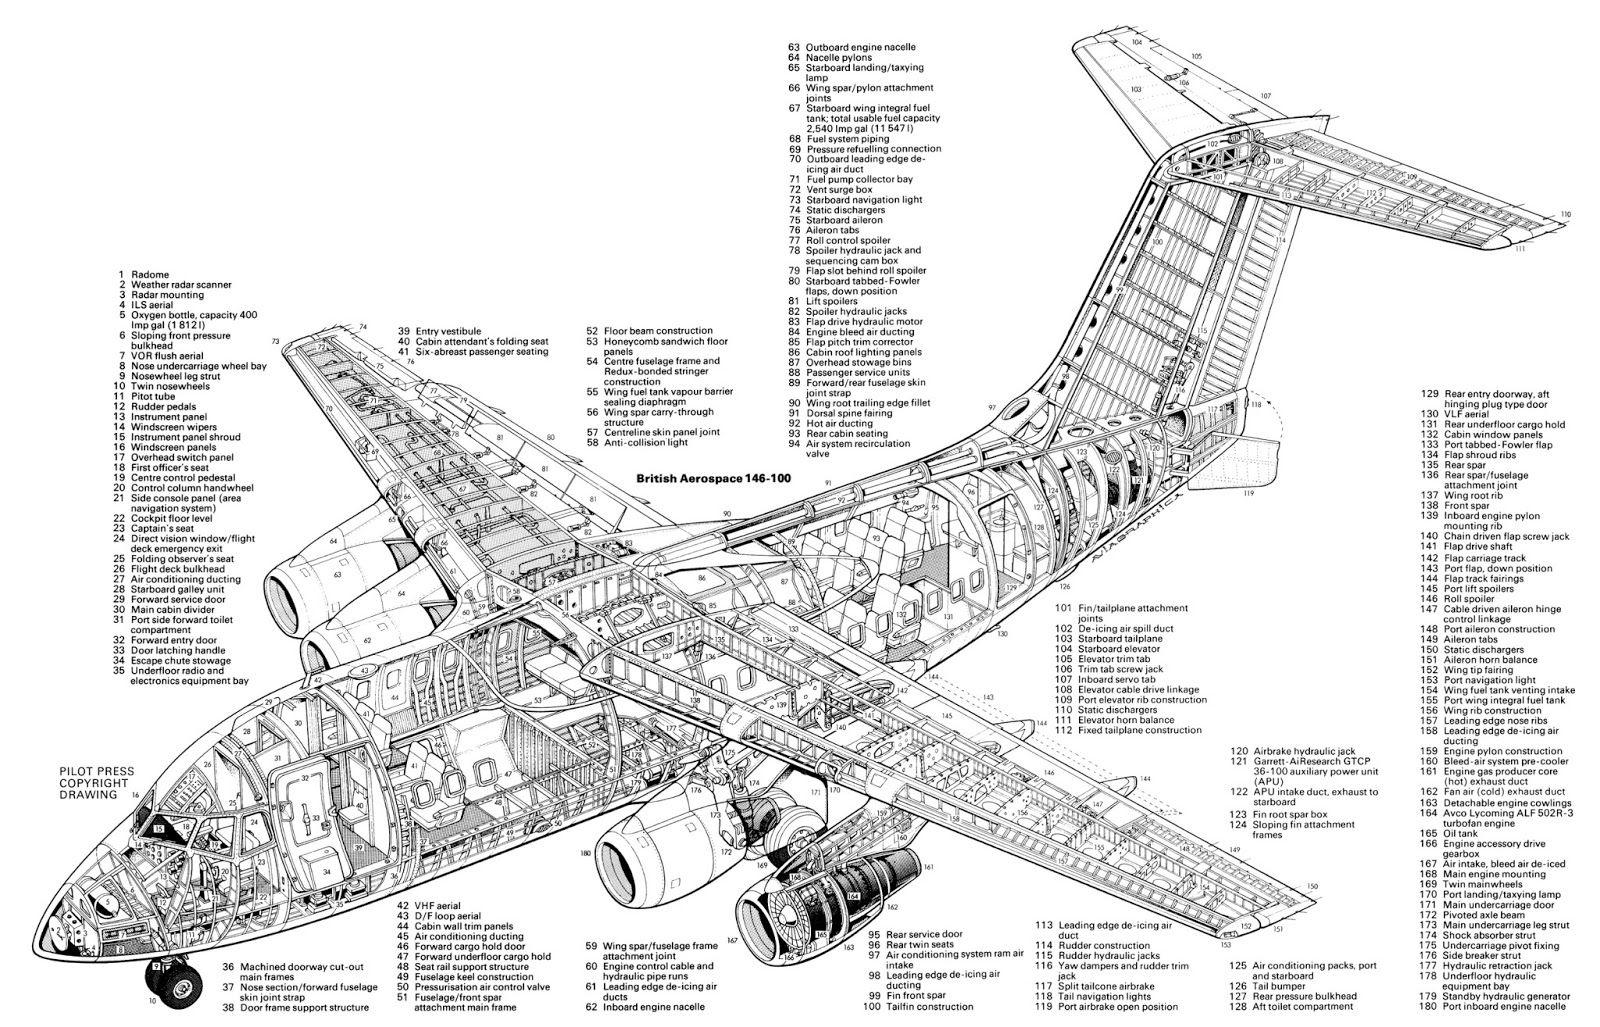 Britishaerospace146100a Jpg 1600 1027 Aircraft Design